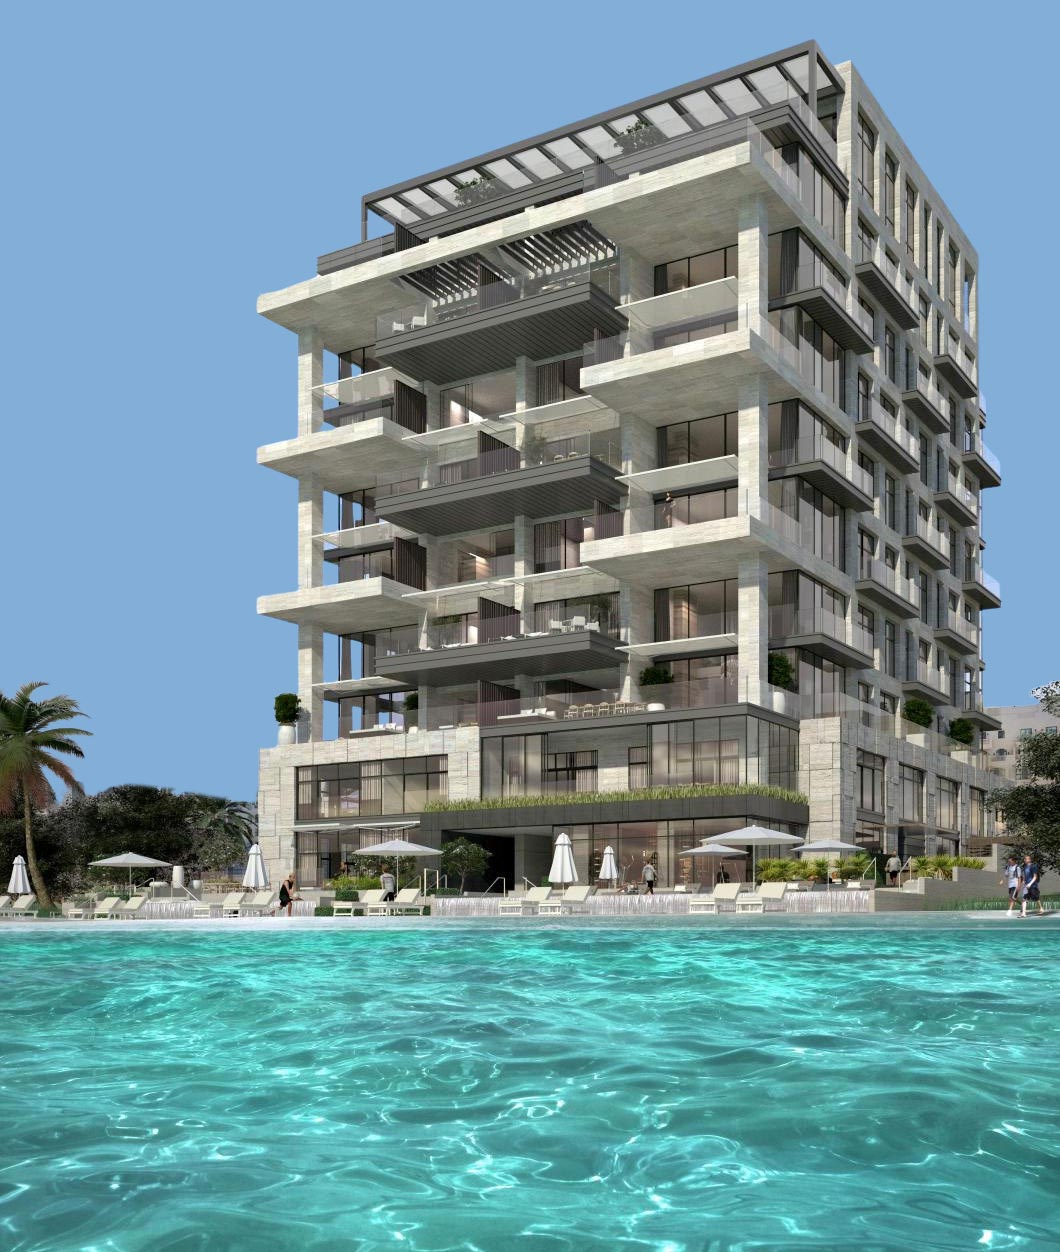 Palme Couture Residences: Apartments for Sale on Dubai Palm Jumeirah